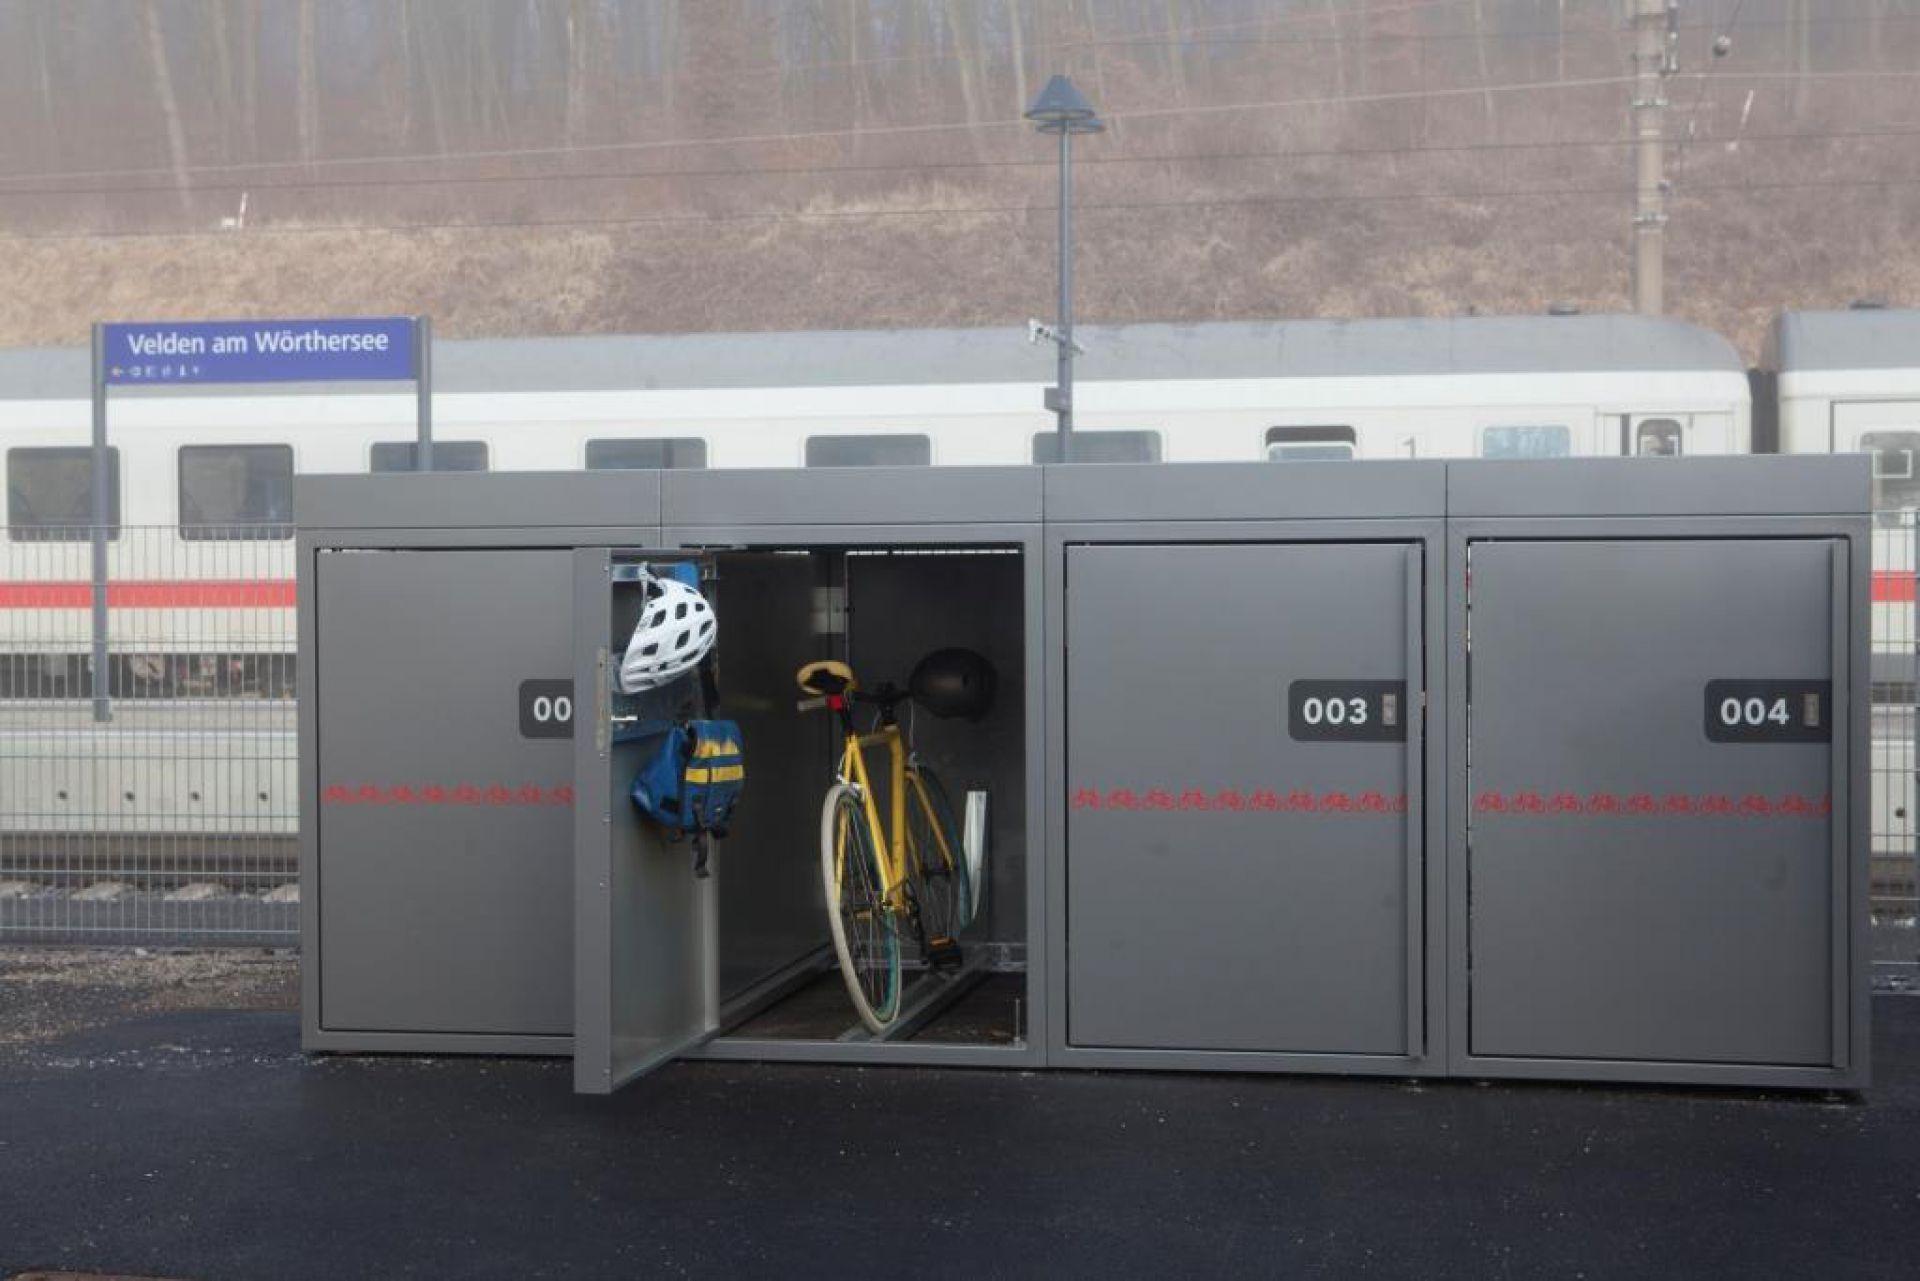 Radbox Kärnten VCÖ Vorbildhafte Mobilitätsprojekte